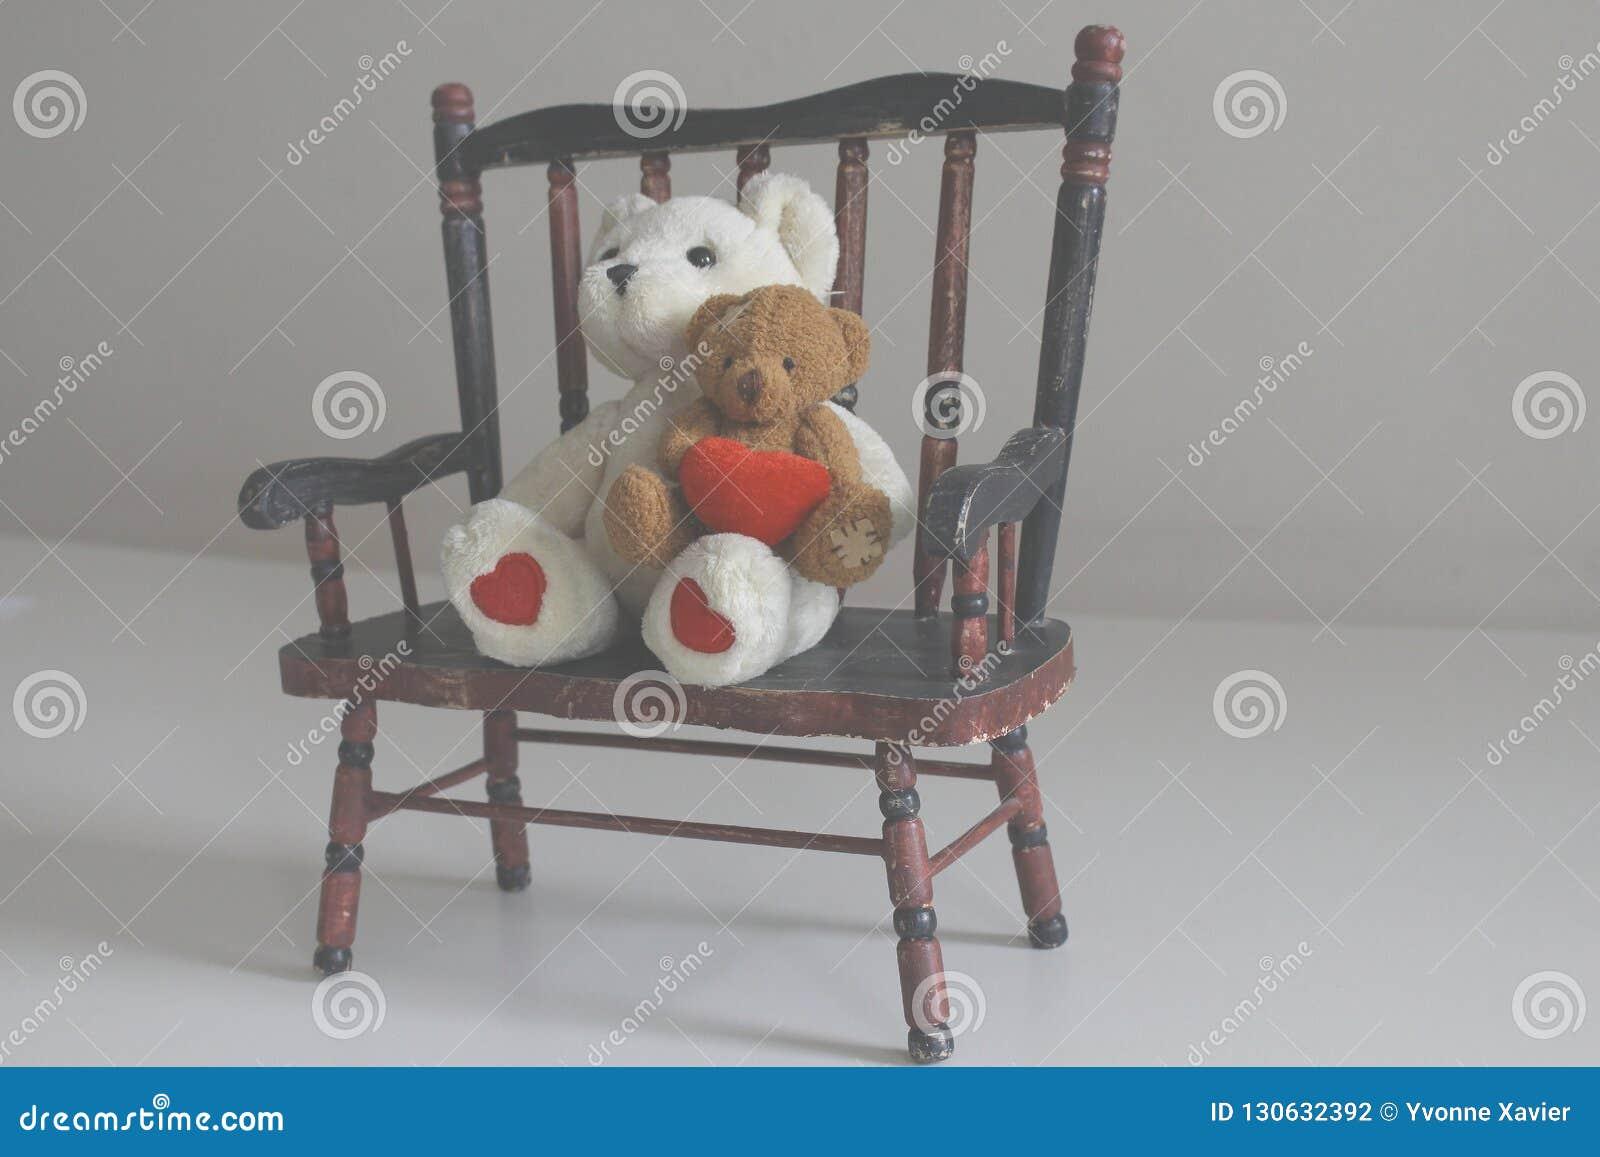 Awe Inspiring Teddy Bears On A Wooden Bench Stock Photo Image Of Sitting Inzonedesignstudio Interior Chair Design Inzonedesignstudiocom